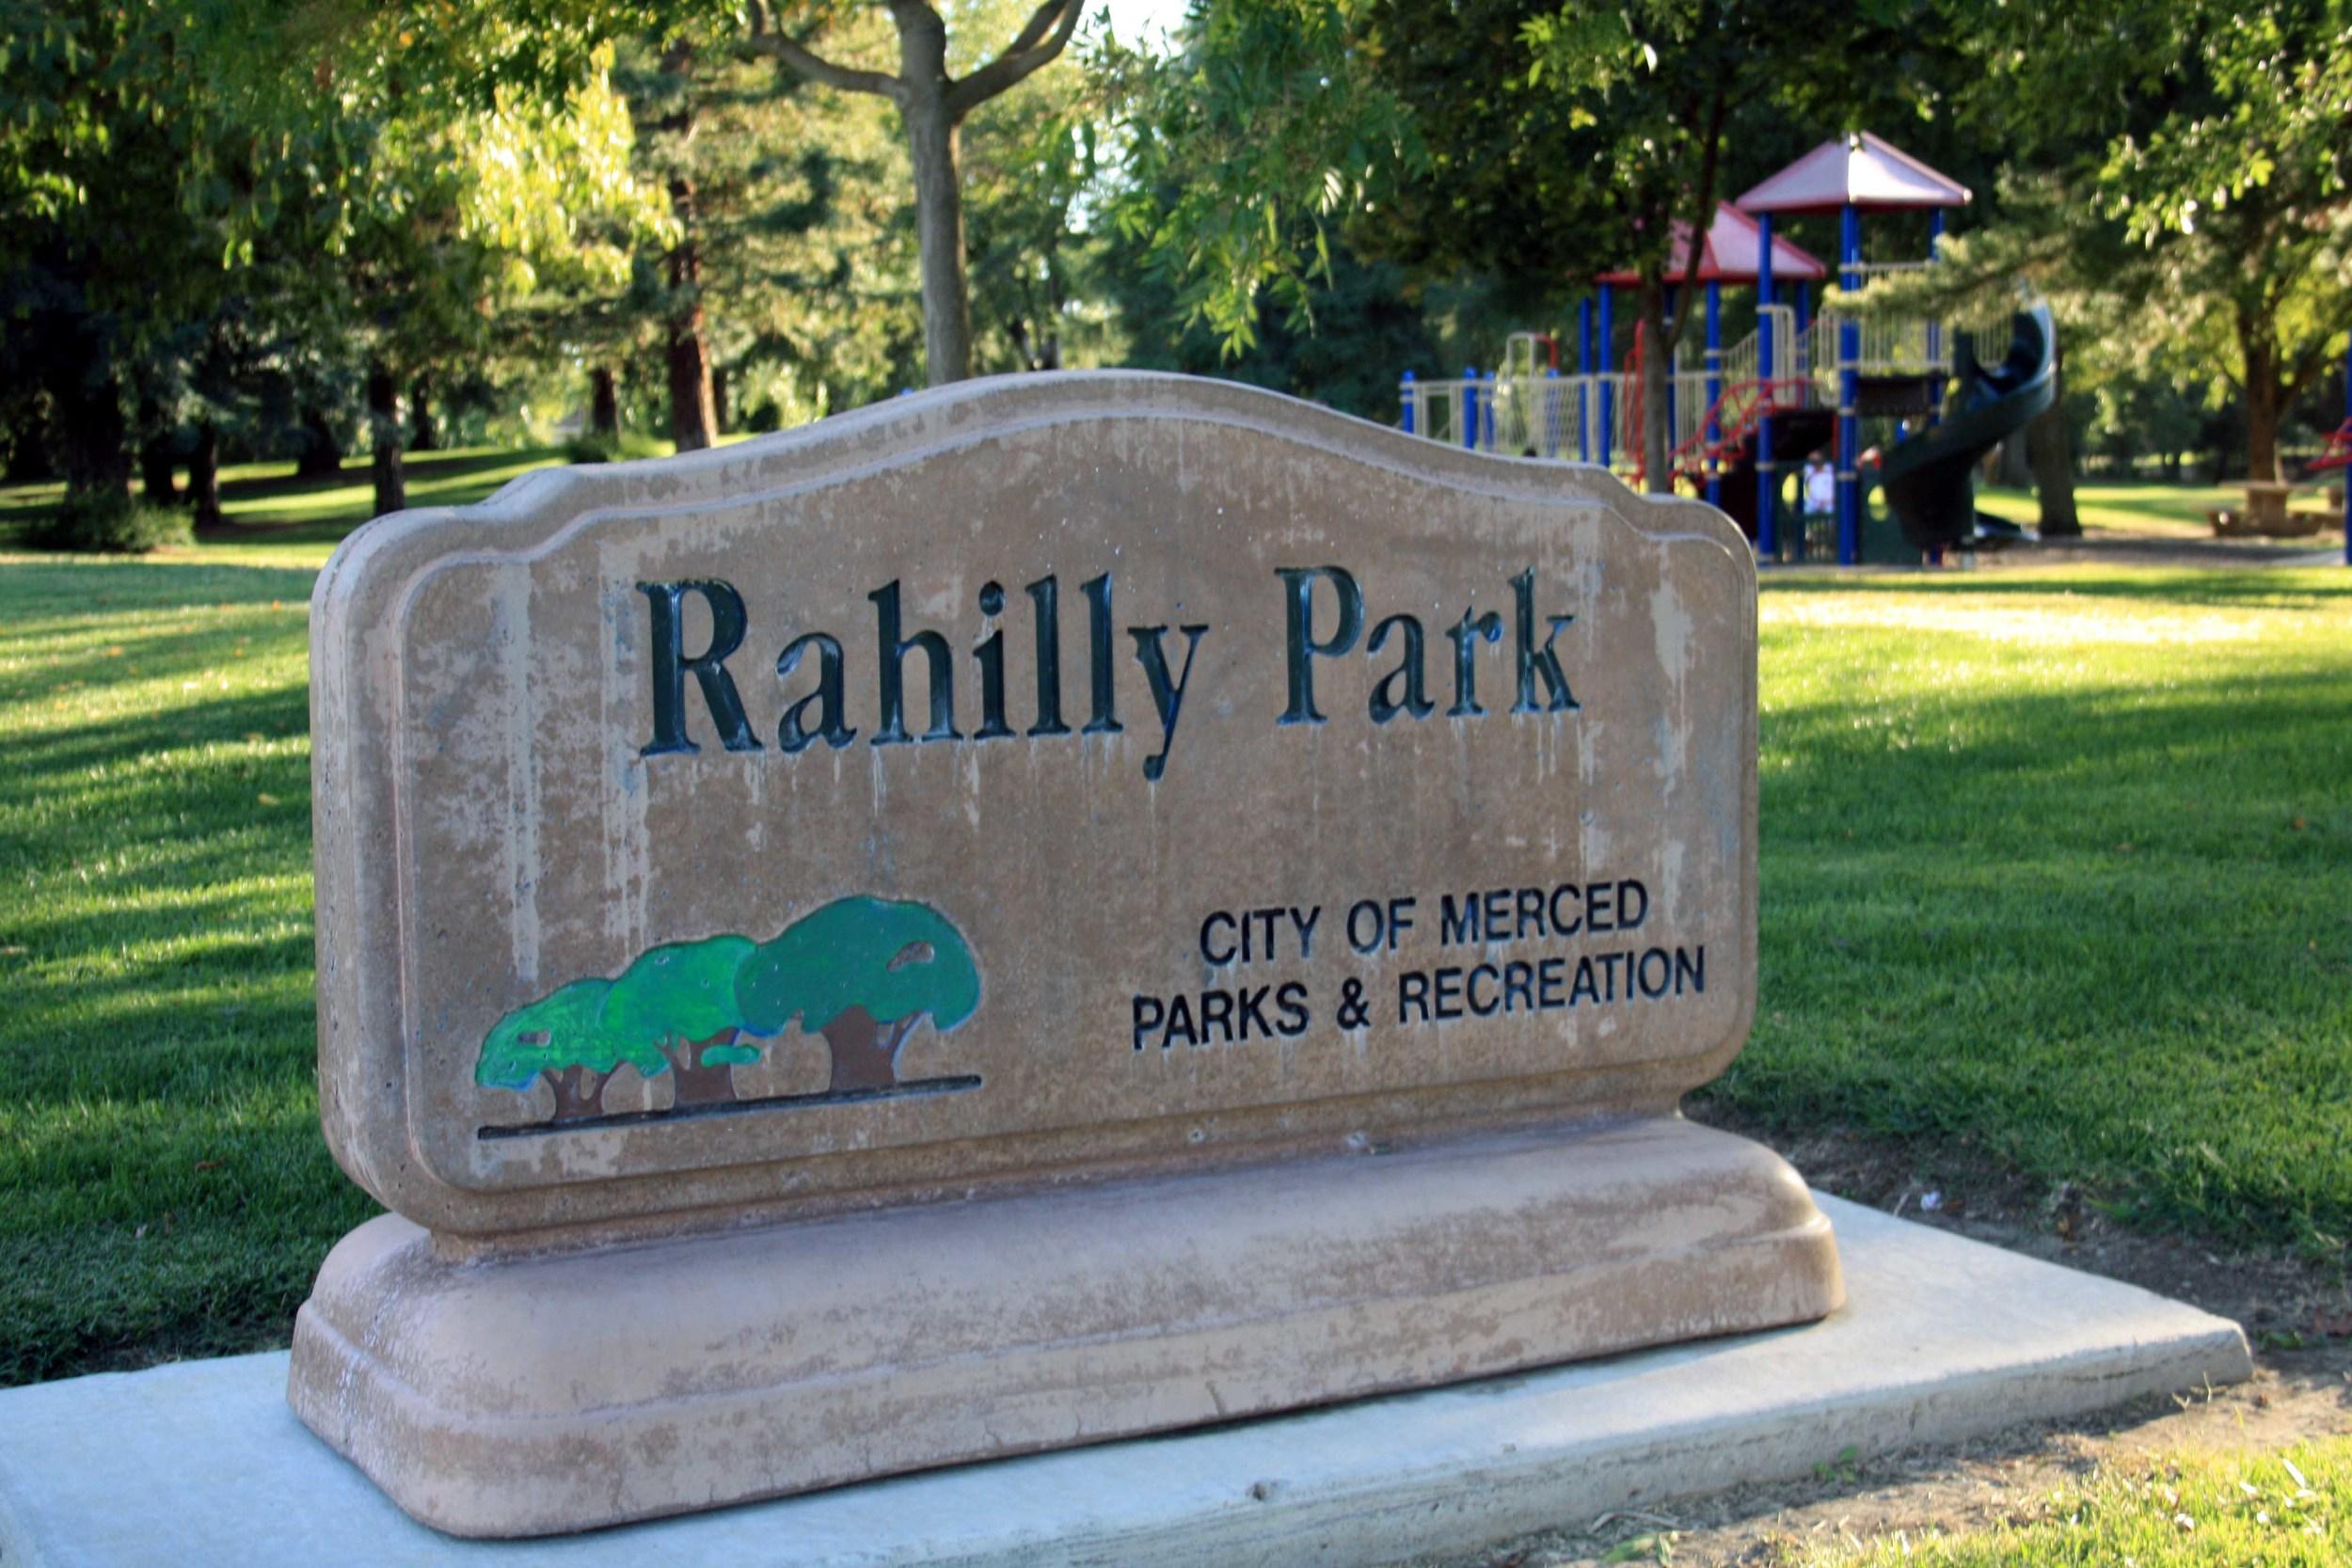 Rahilly Park - PHOTO BY ADAM BLAUERT